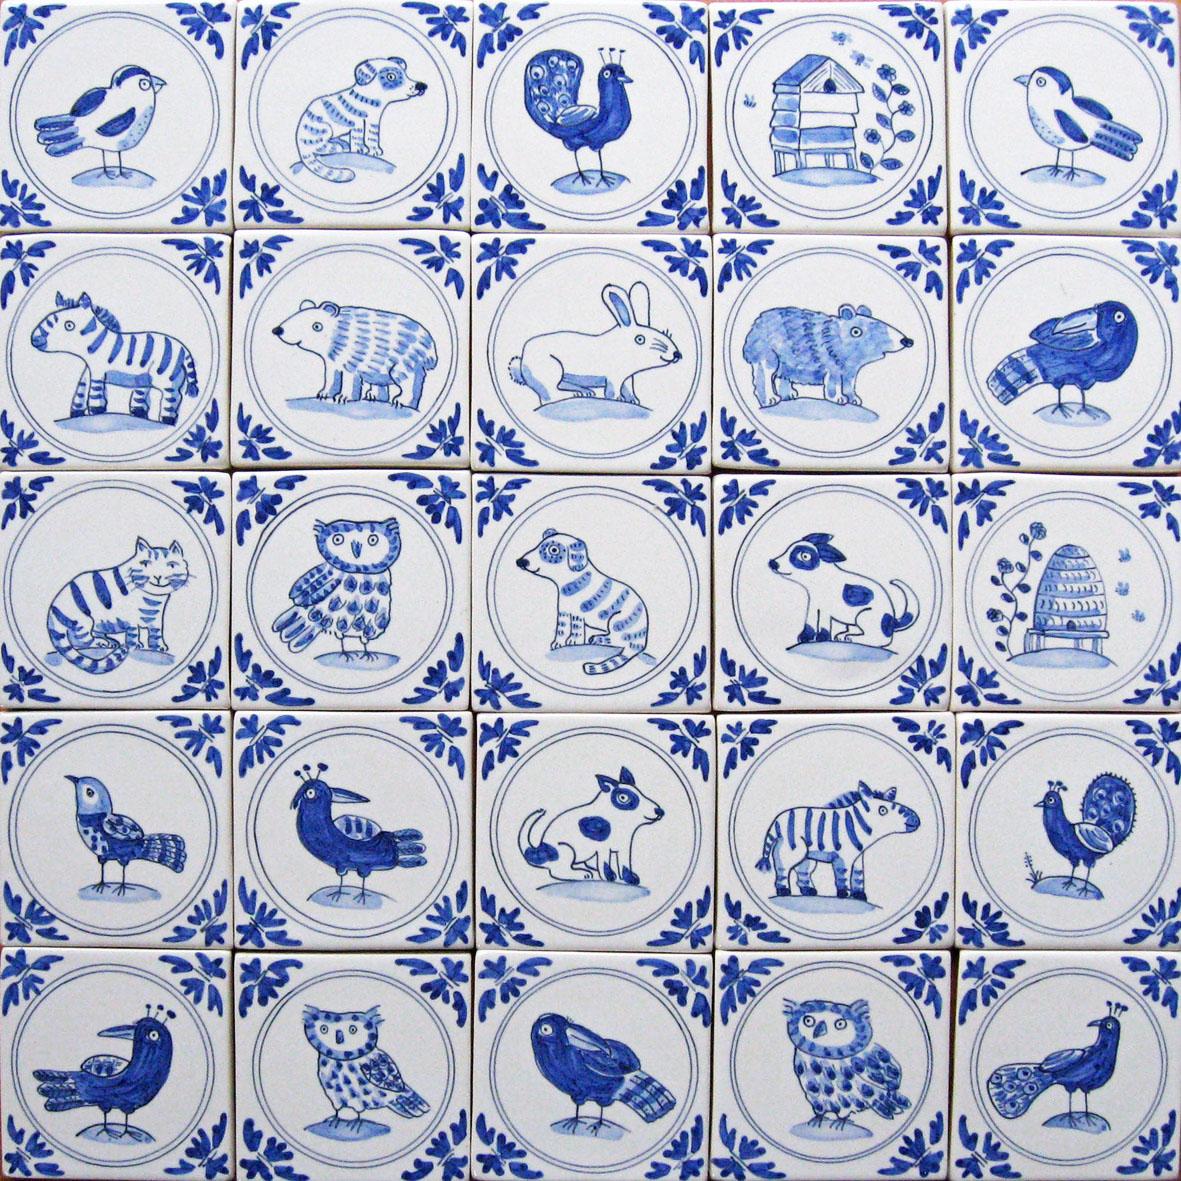 Mini Delft animal and bird tiles